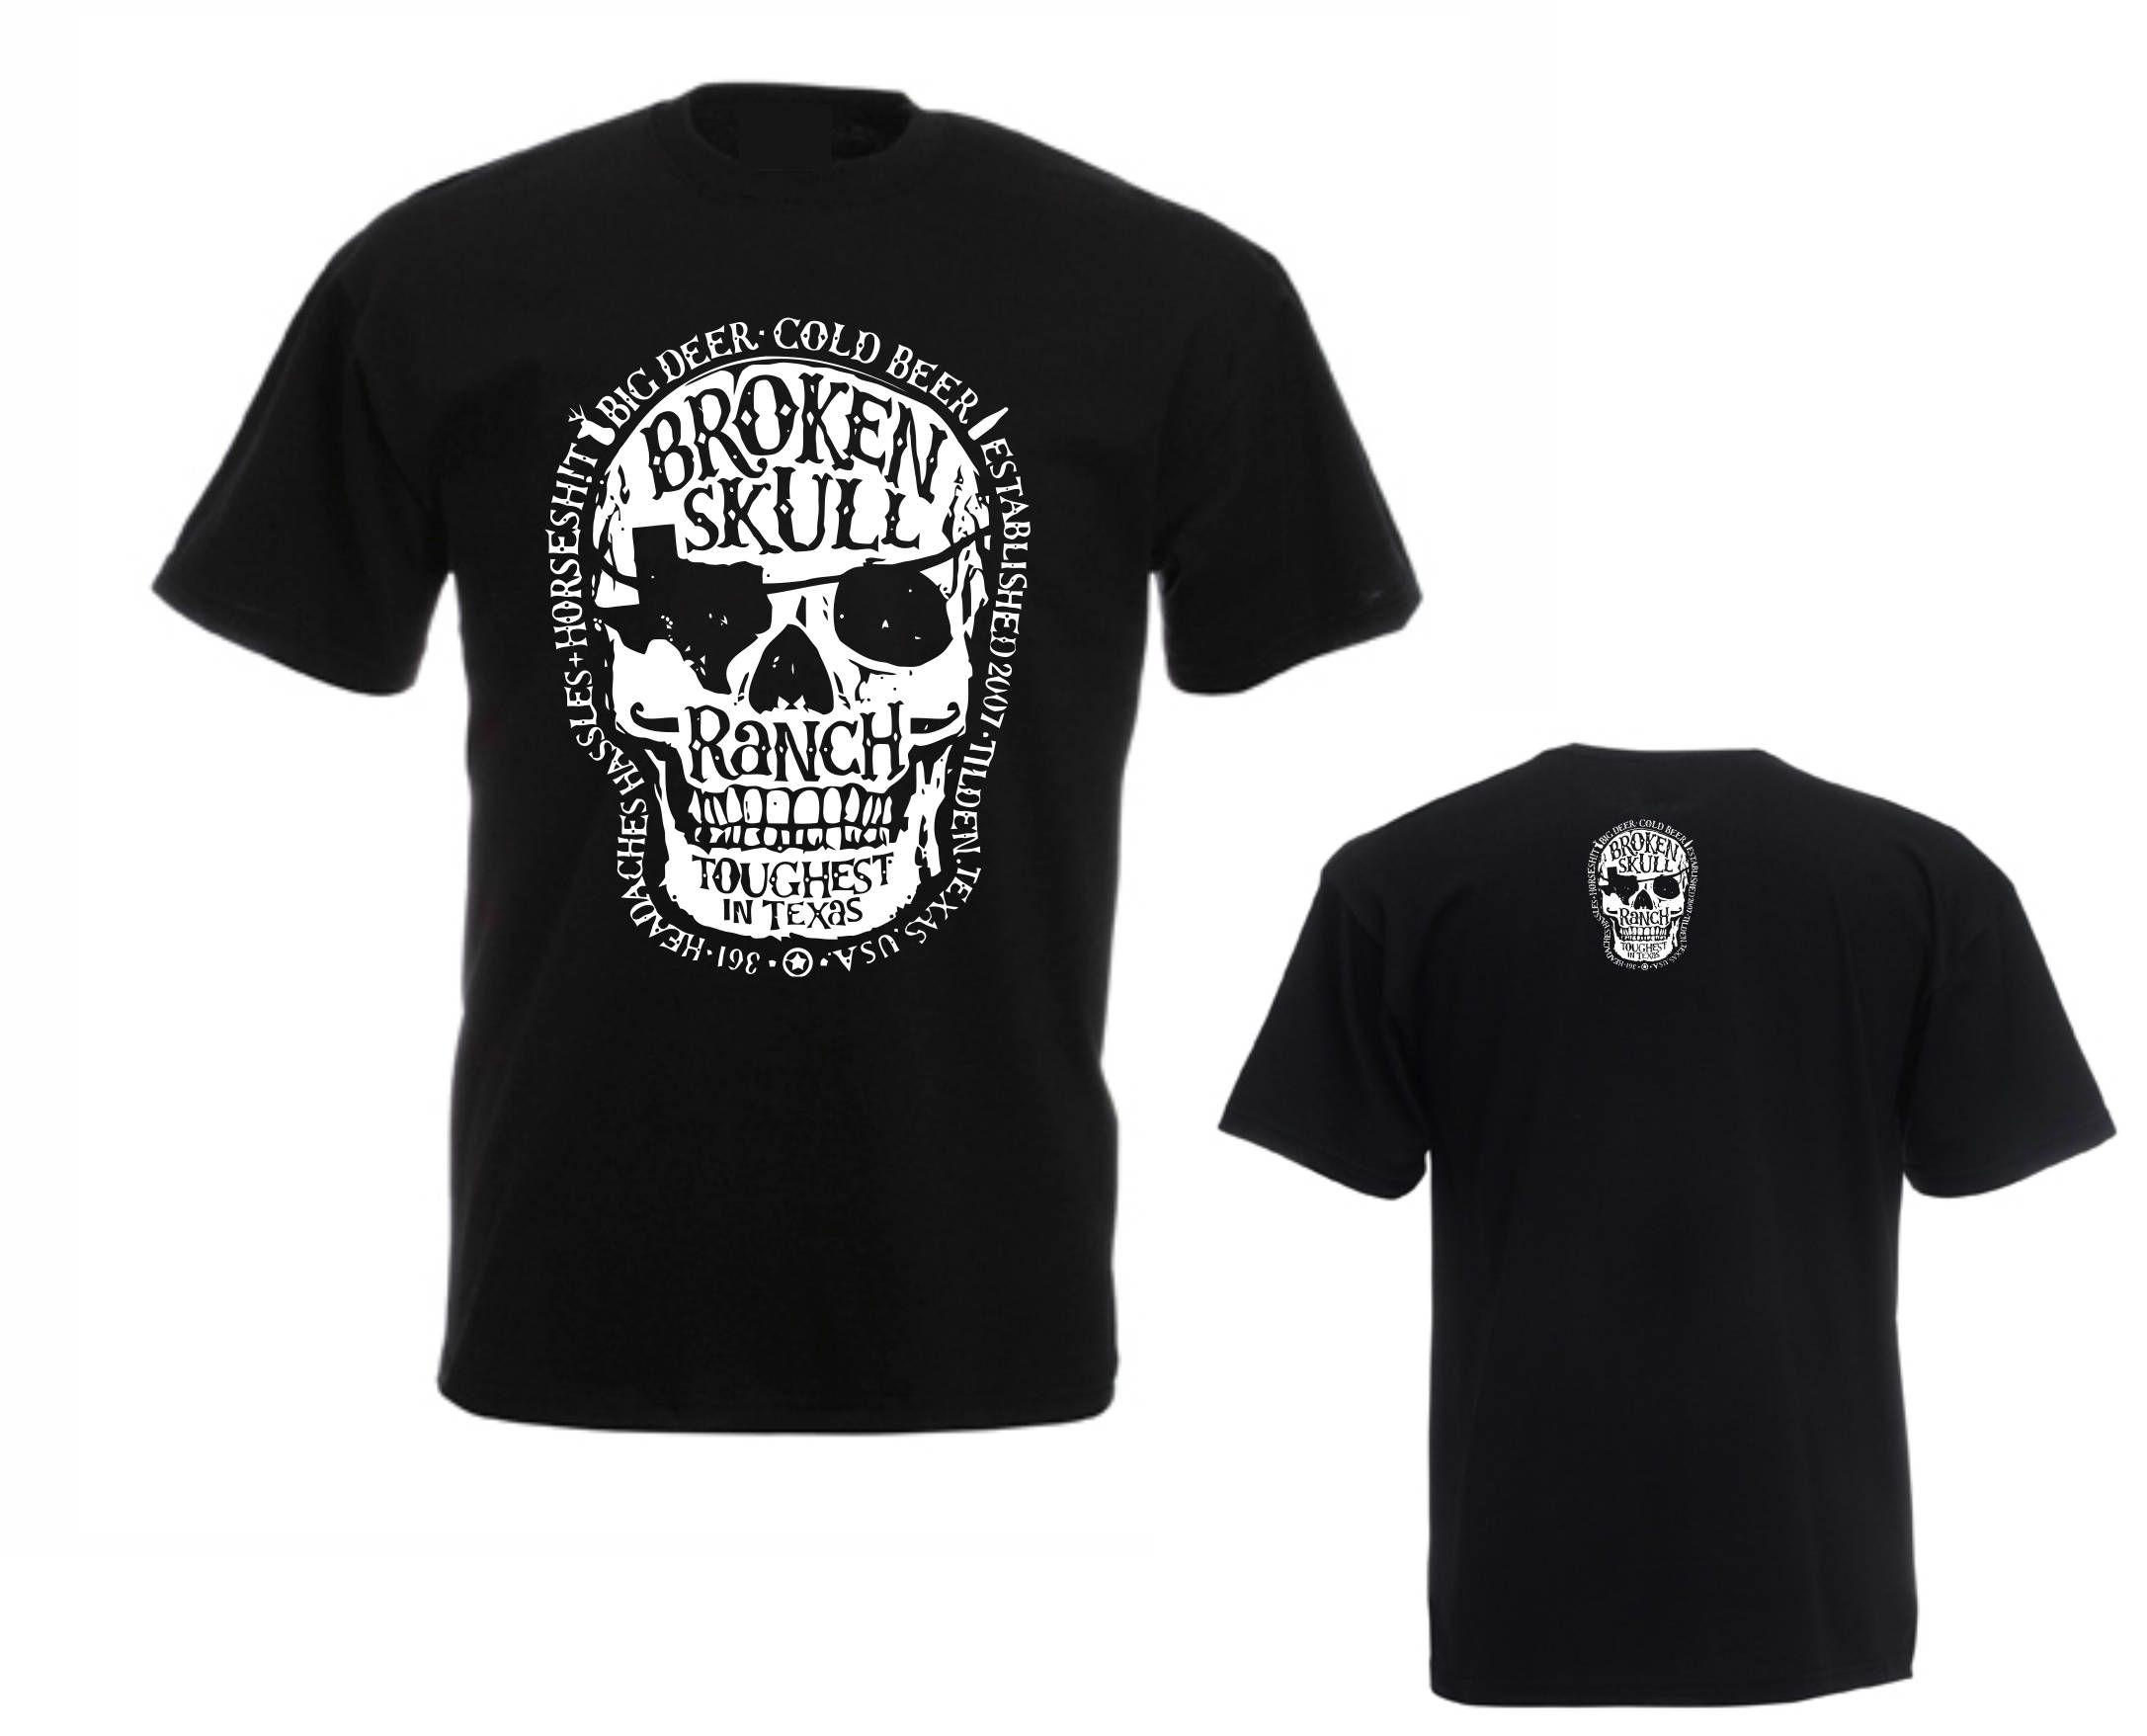 John Lennon Famous Singer Logo Men/'s Black T-Shirt Size S M L XL 2XL 3XL